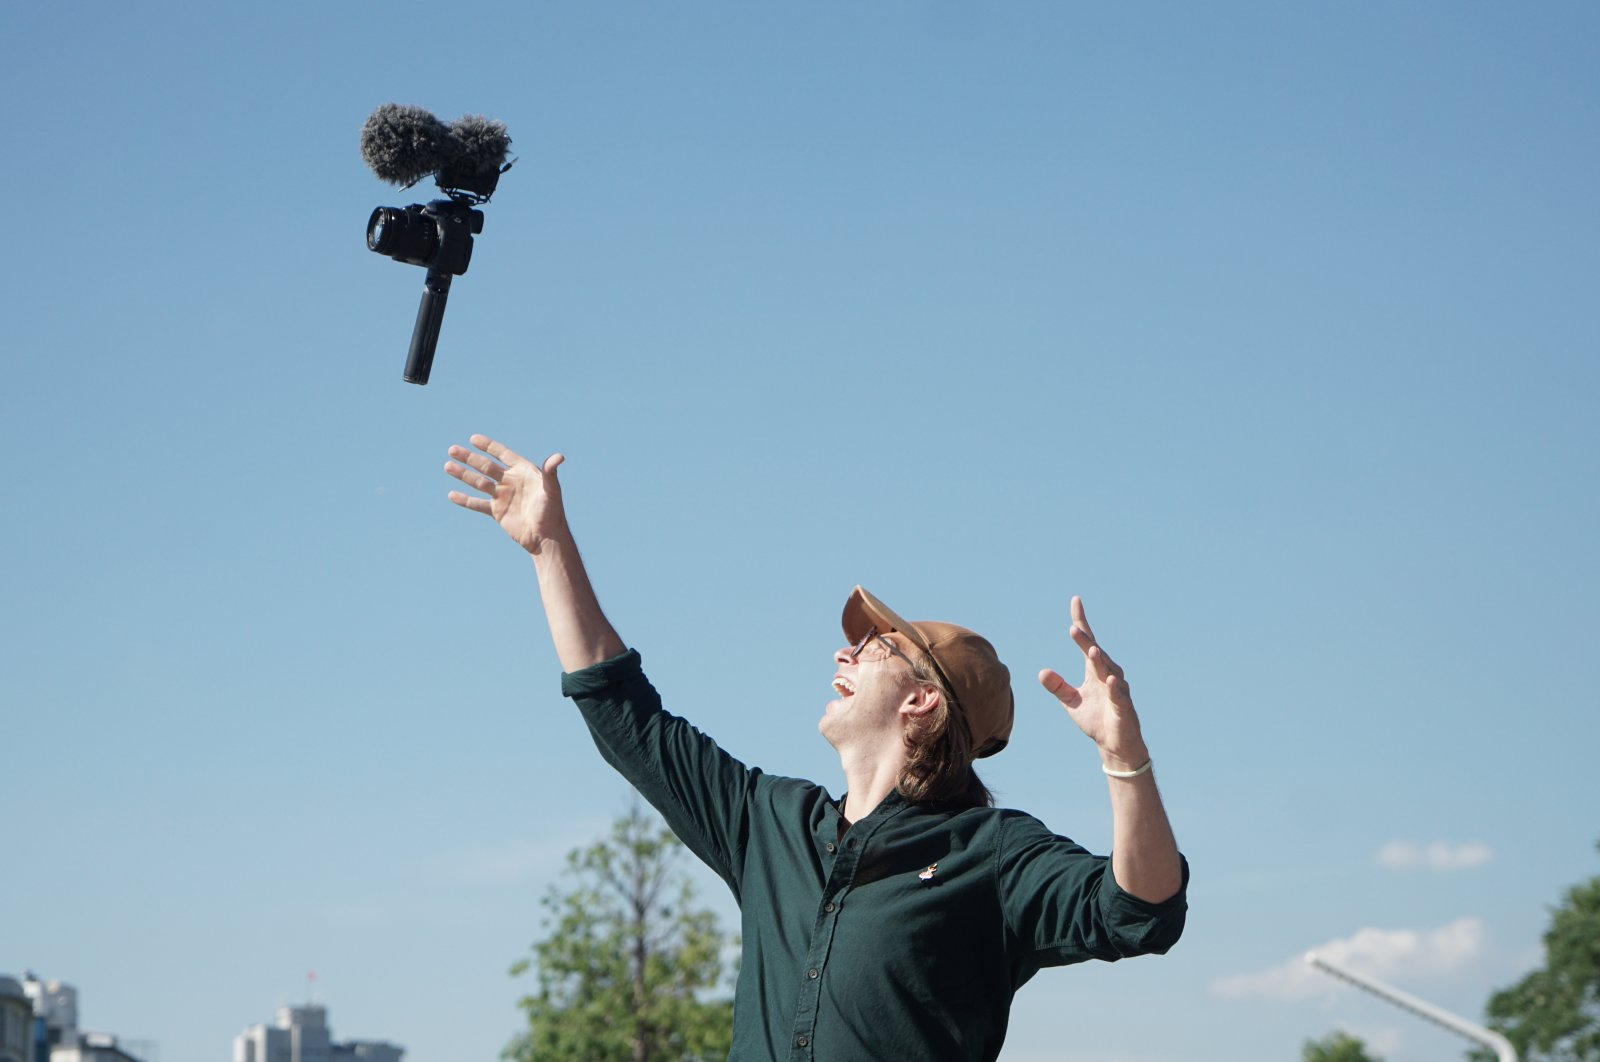 Franco Dubini poses throwing his camera in Istanbul, Turkey, June 20, 2021. (AA Photo)